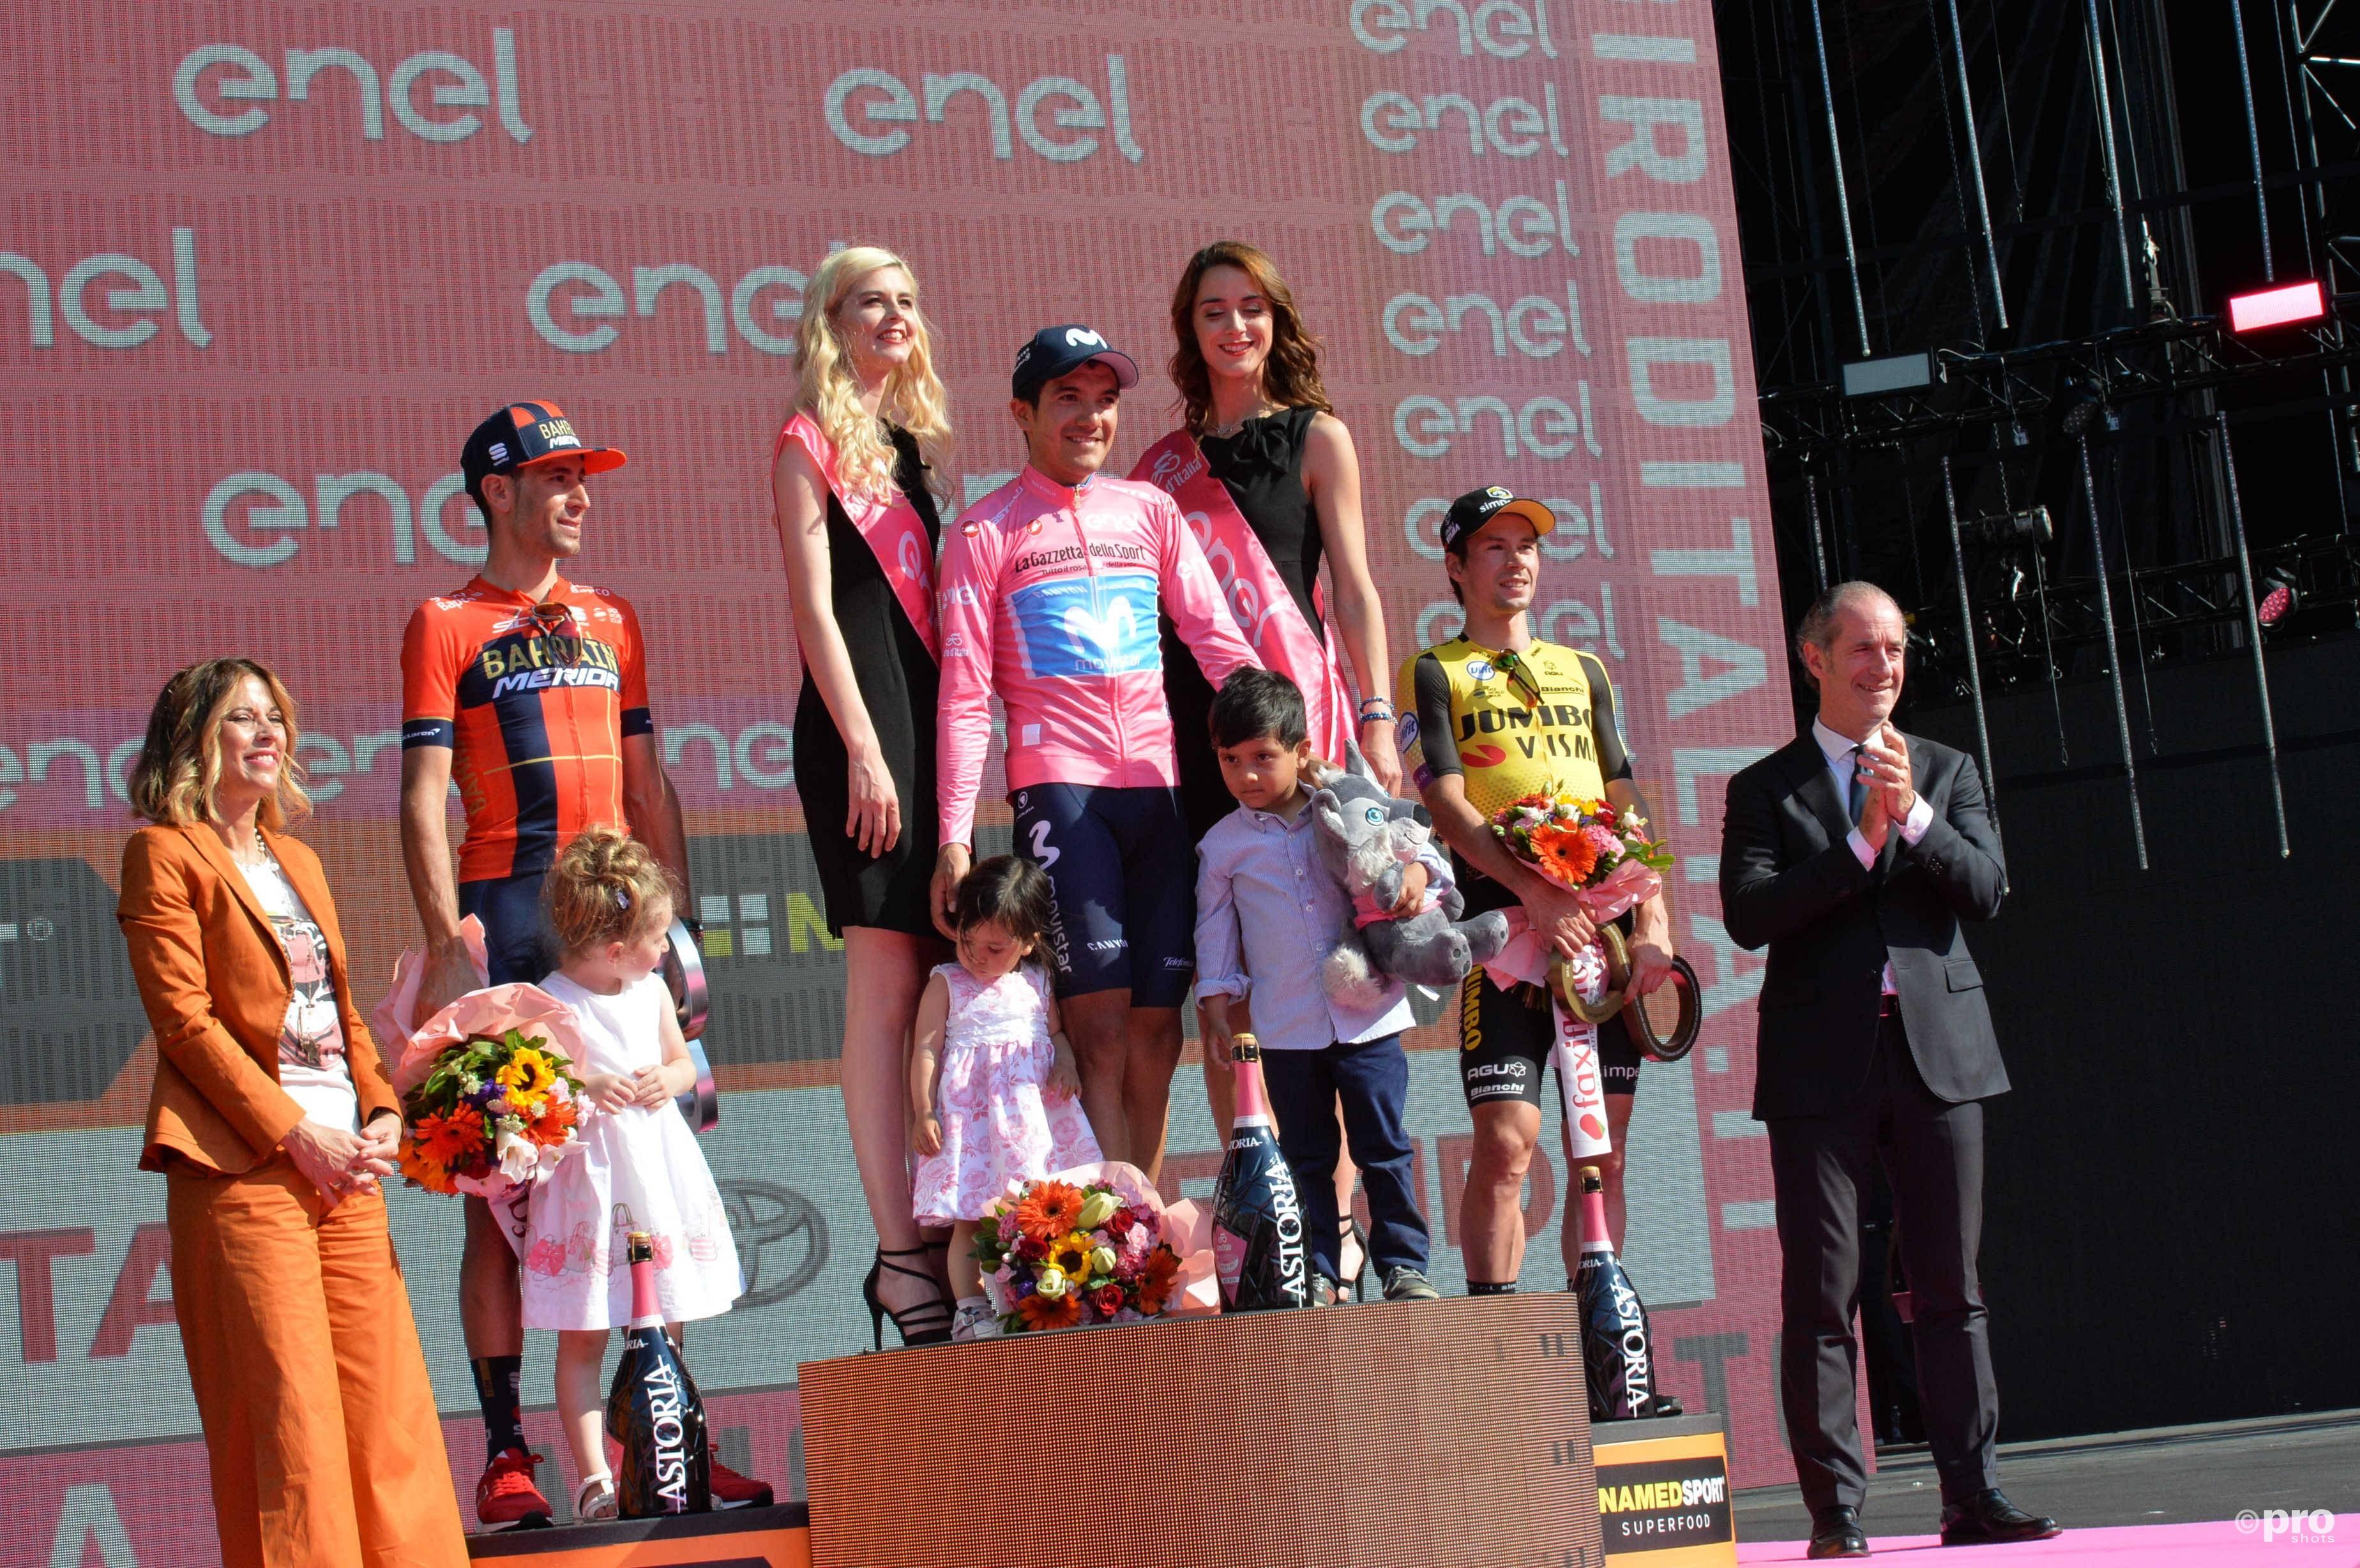 Carapaz winnaar 102de Giro d'Italia (Pro Shots / Imago)